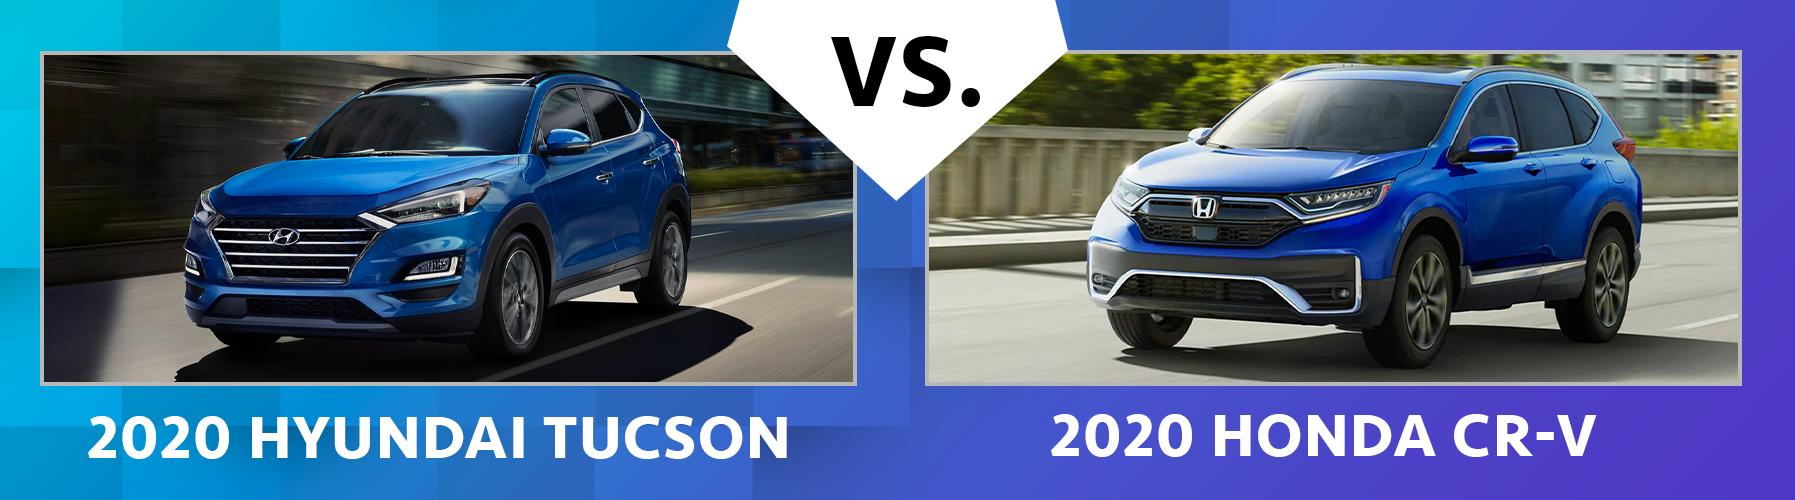 W2020 Hyundai Tucson vs 2020 Honda CR-V Comparisons